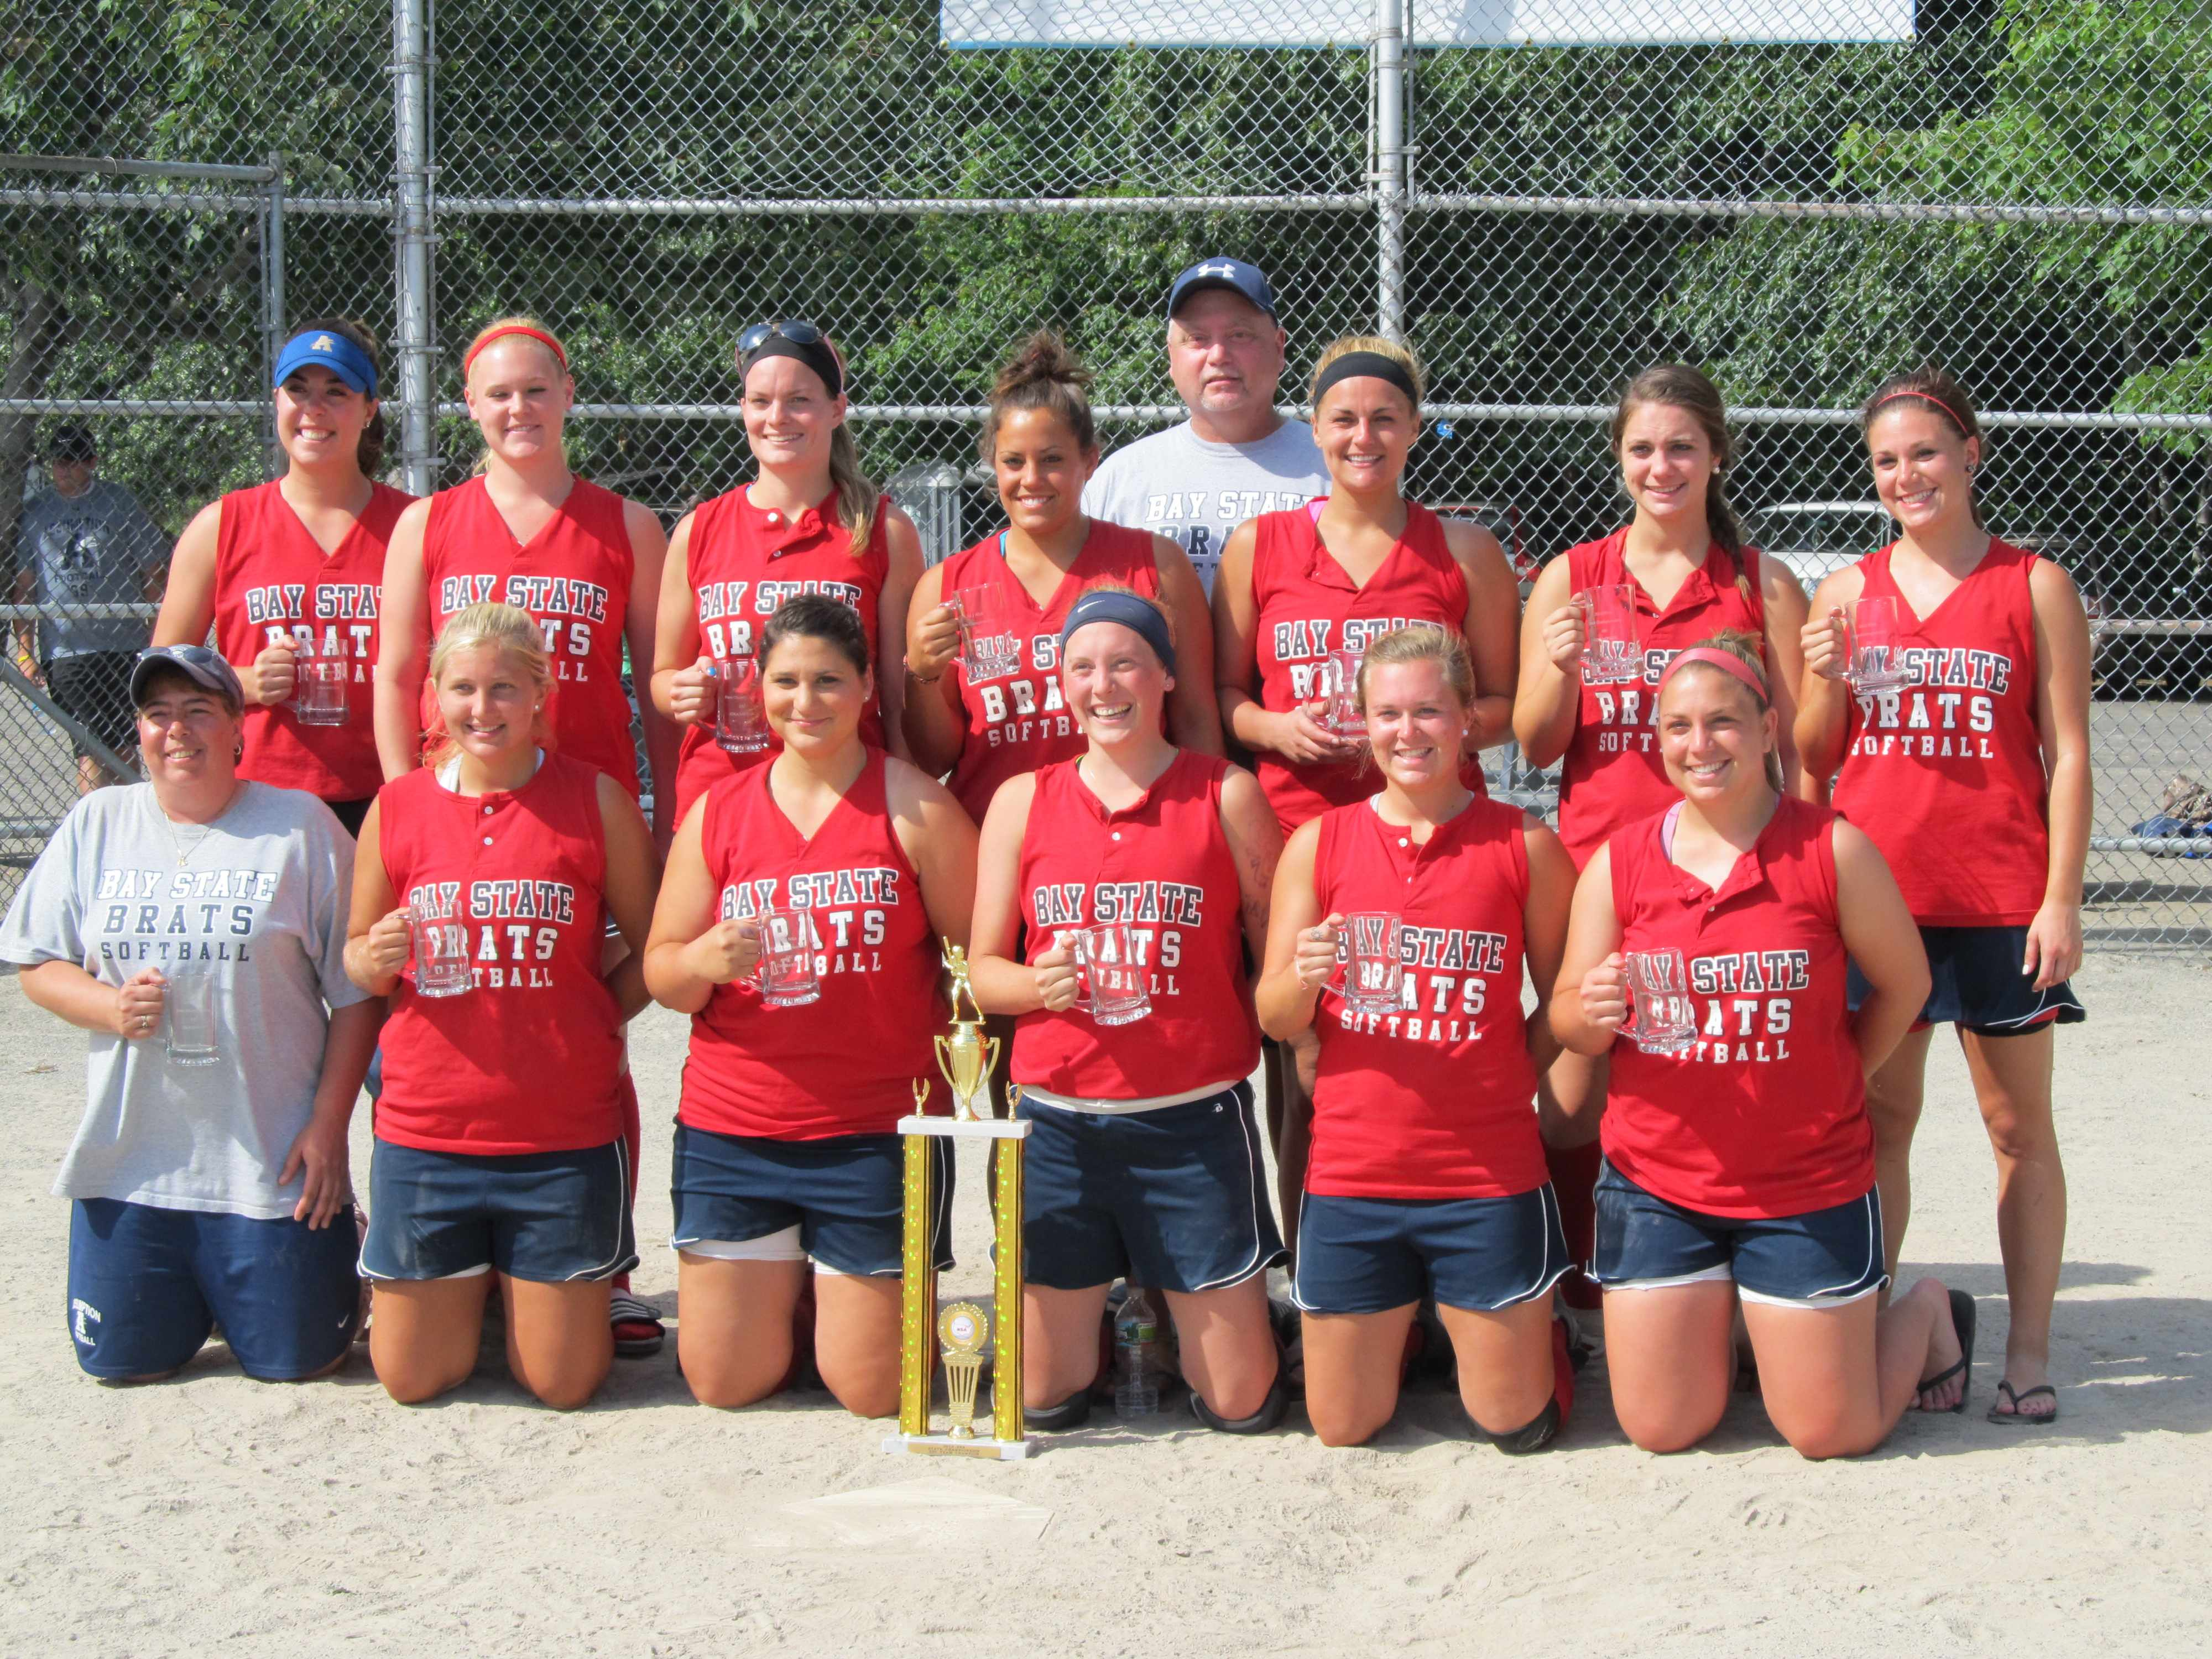 2012 NSA's 23U Massachusetts State Champions